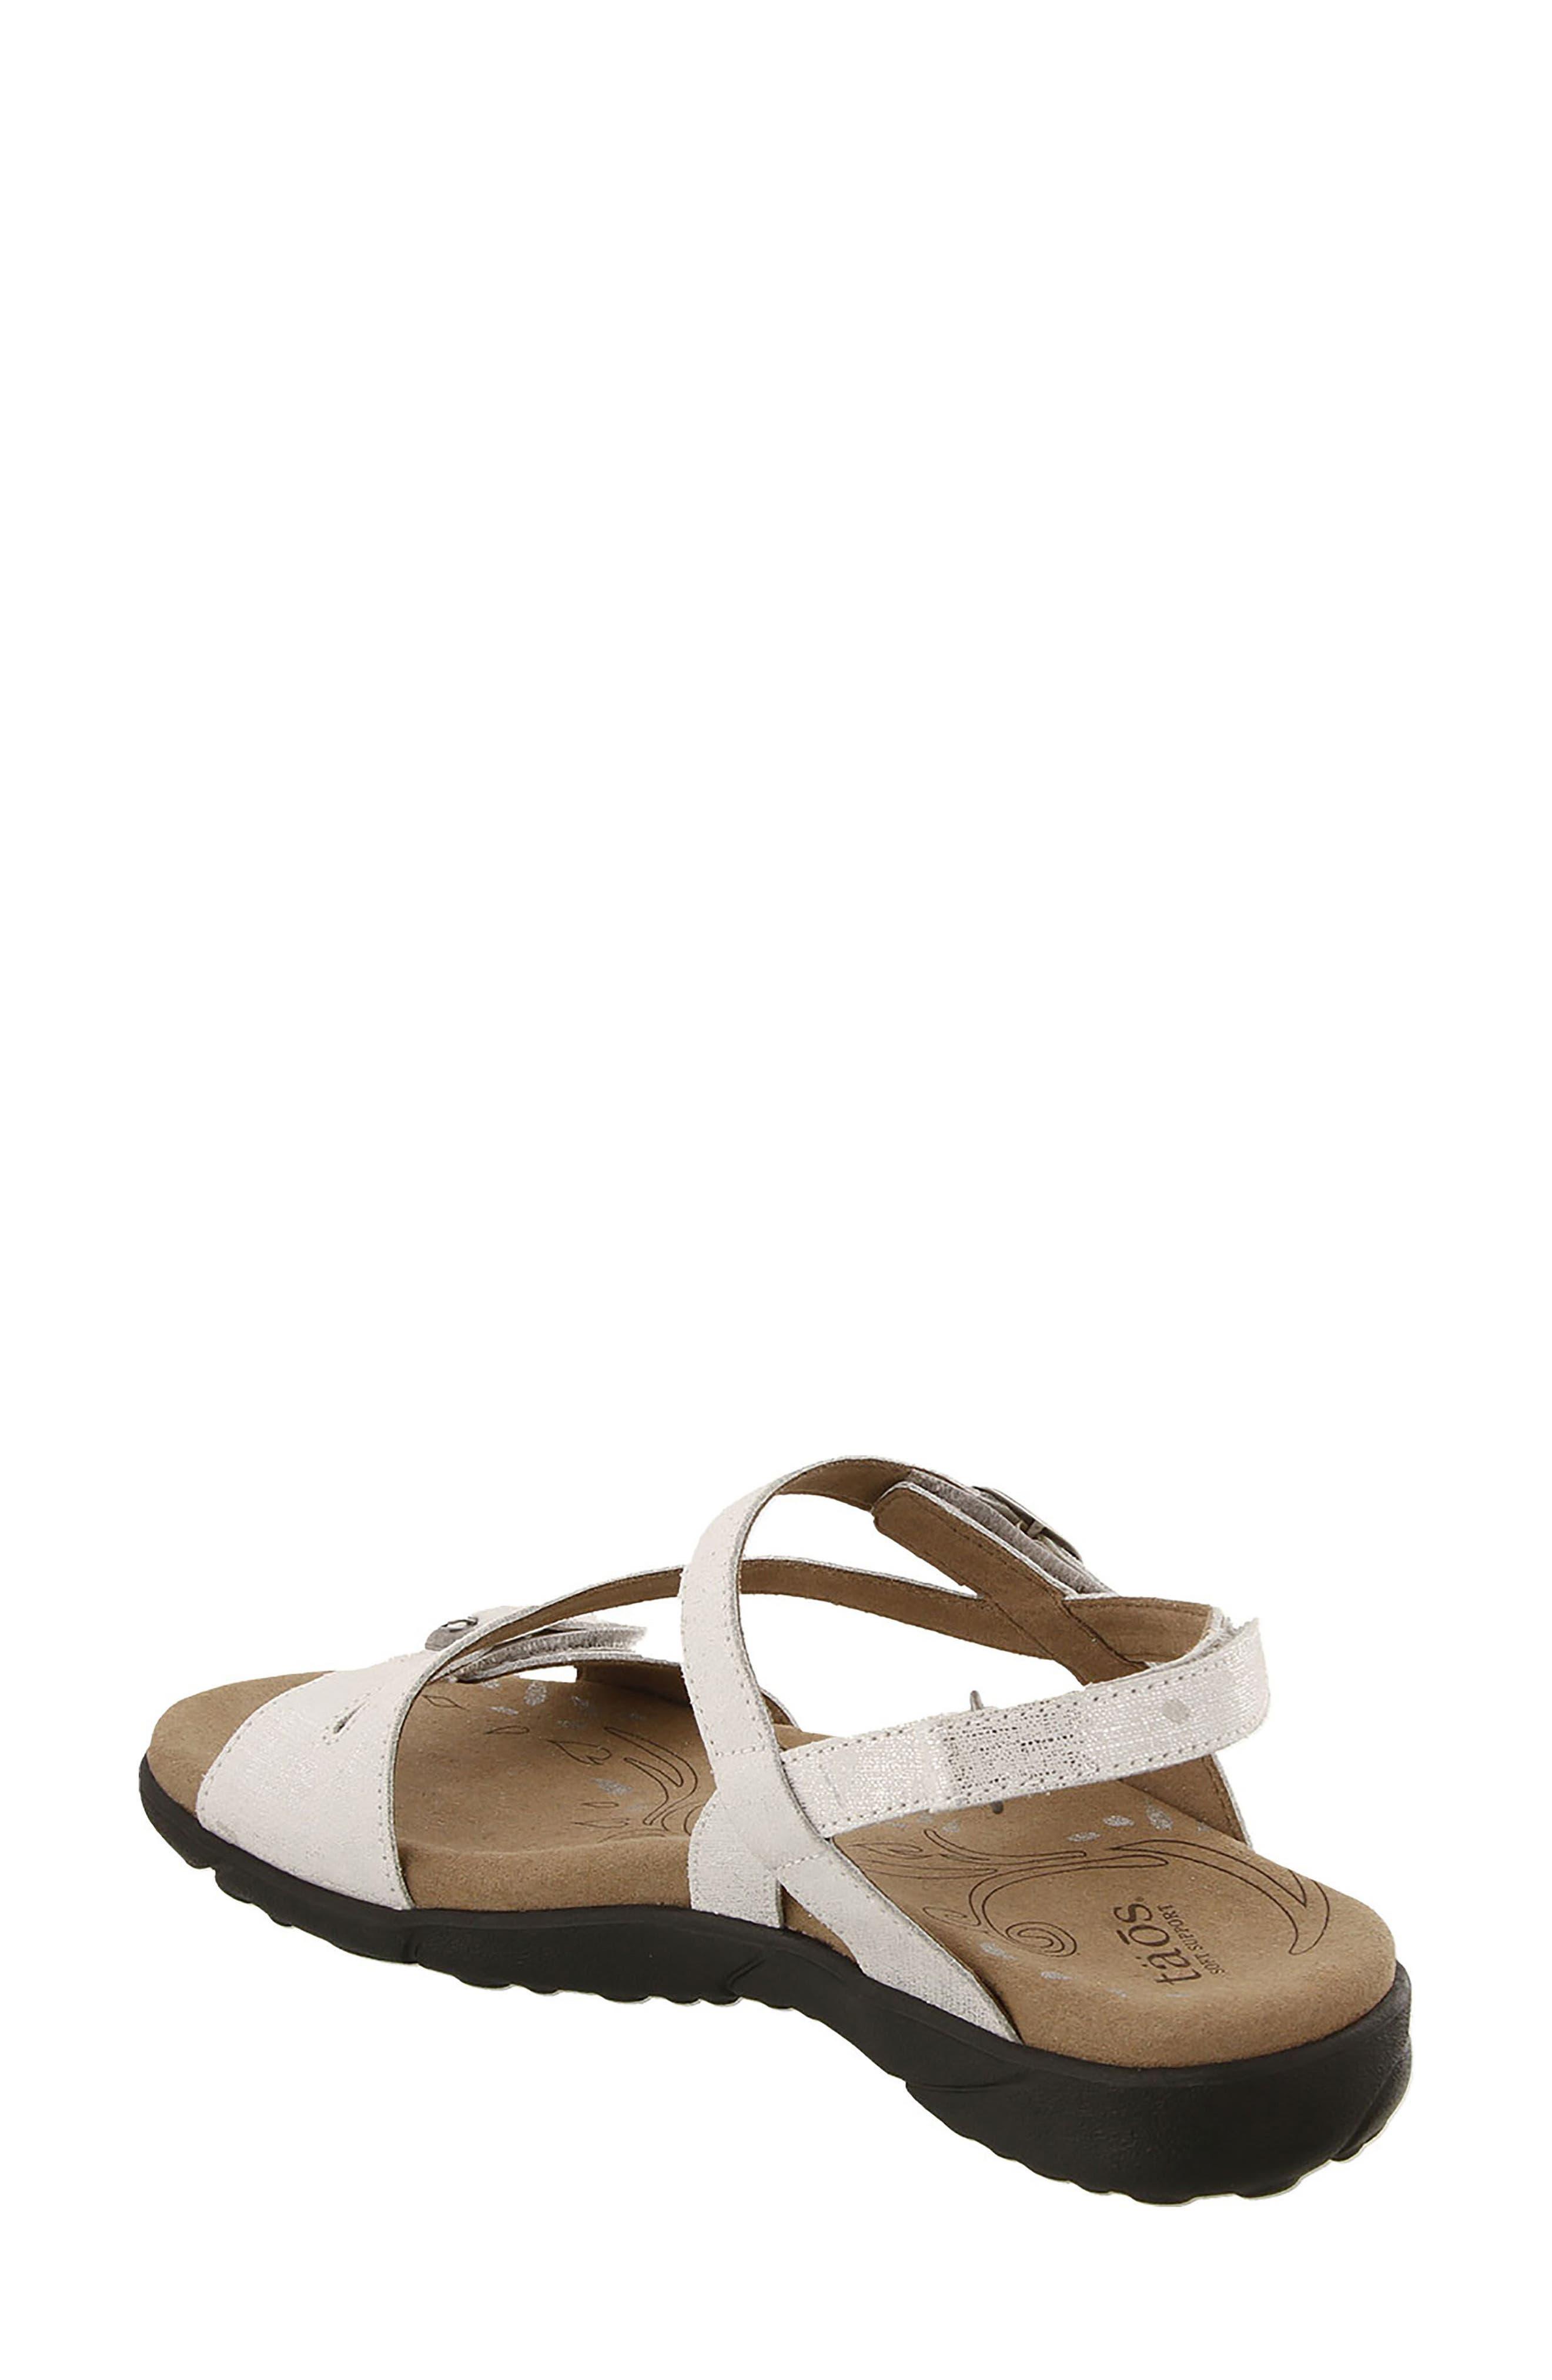 Beauty Sandal,                             Alternate thumbnail 2, color,                             White Metallic Leather